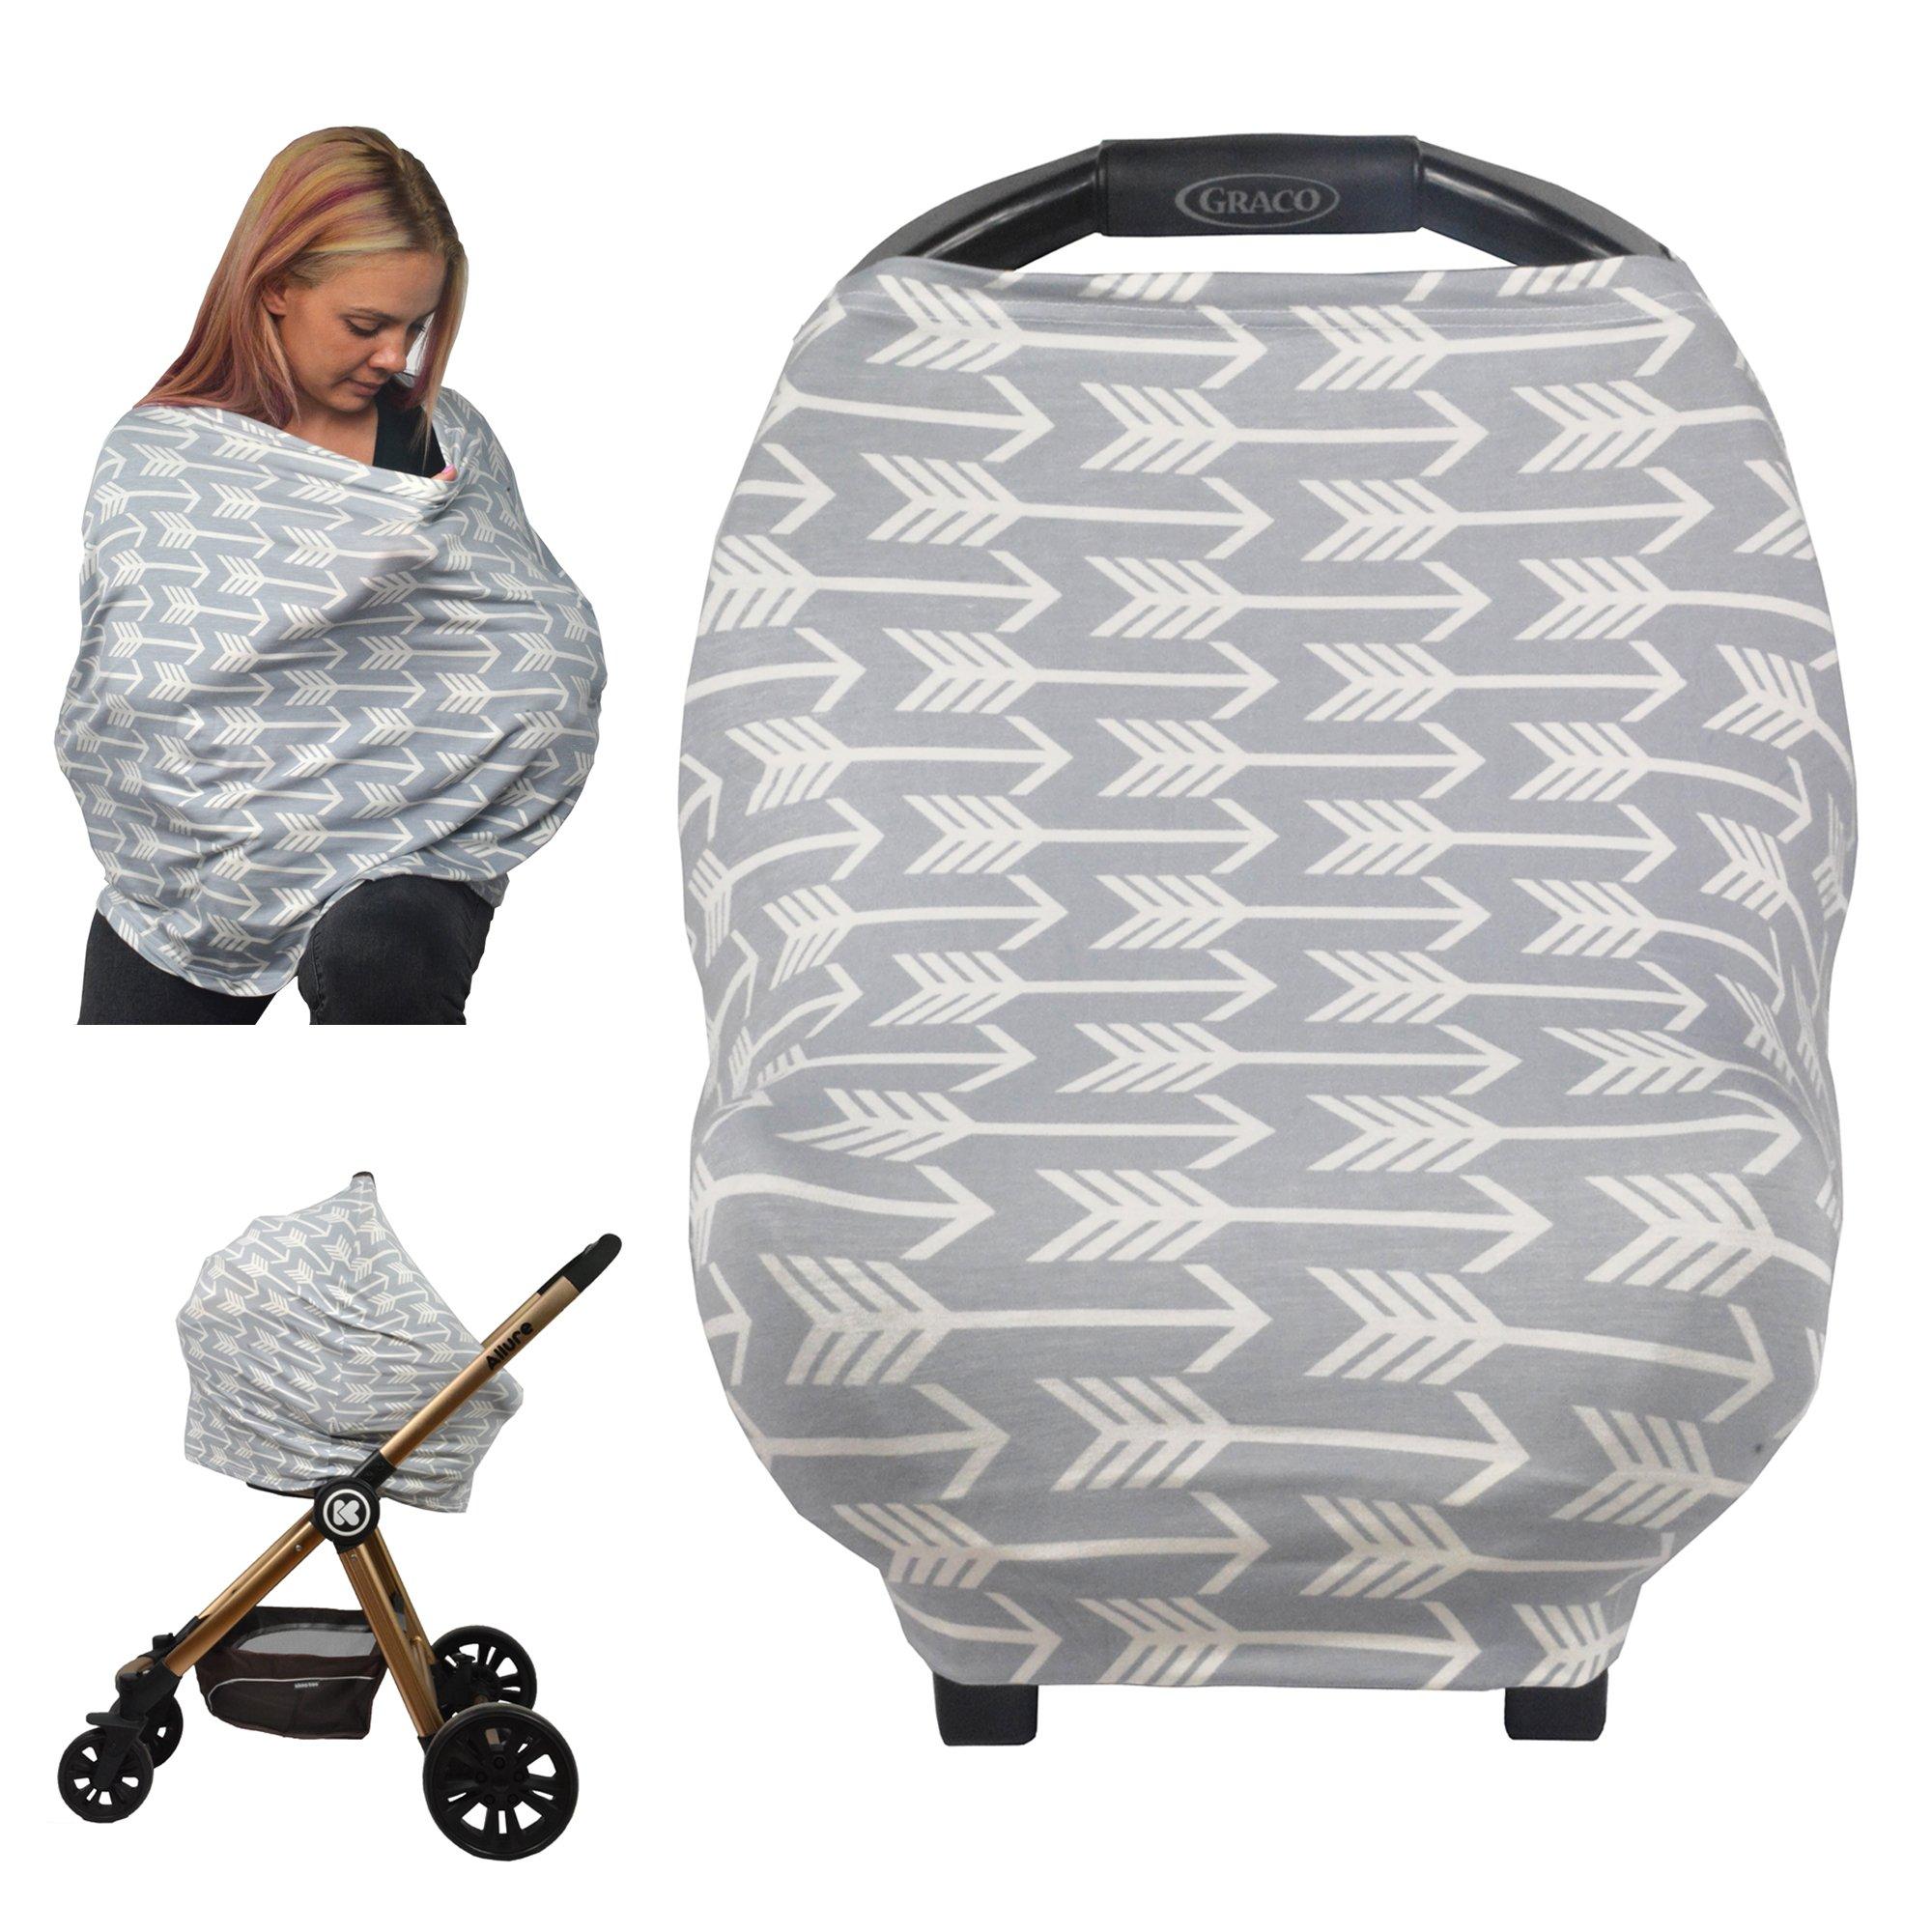 Nursing Breastfeeding Cover Car Seat Canopy Shopping Cart Chair Stroller